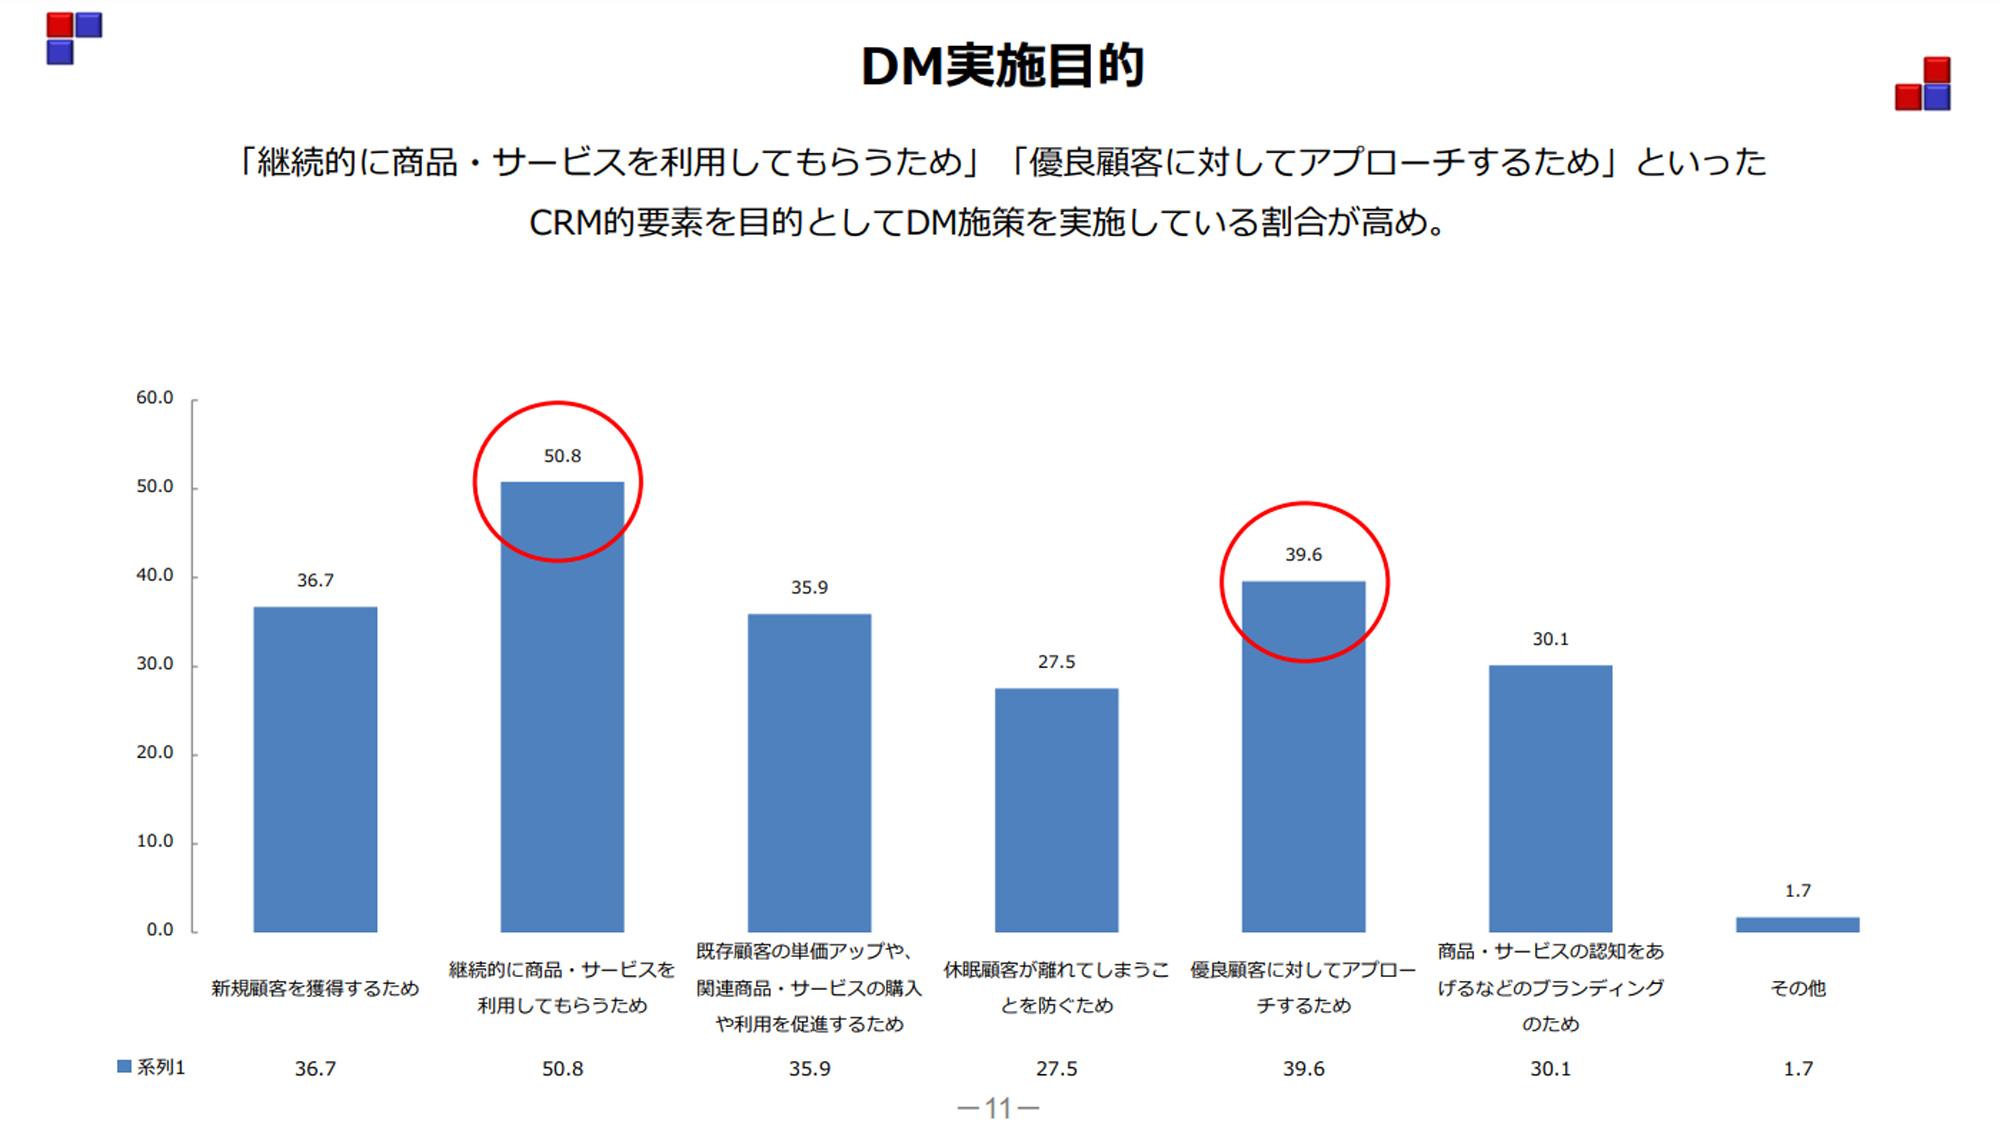 DMの実施目的DM実態調査報告書より(クリック/タップで拡大)